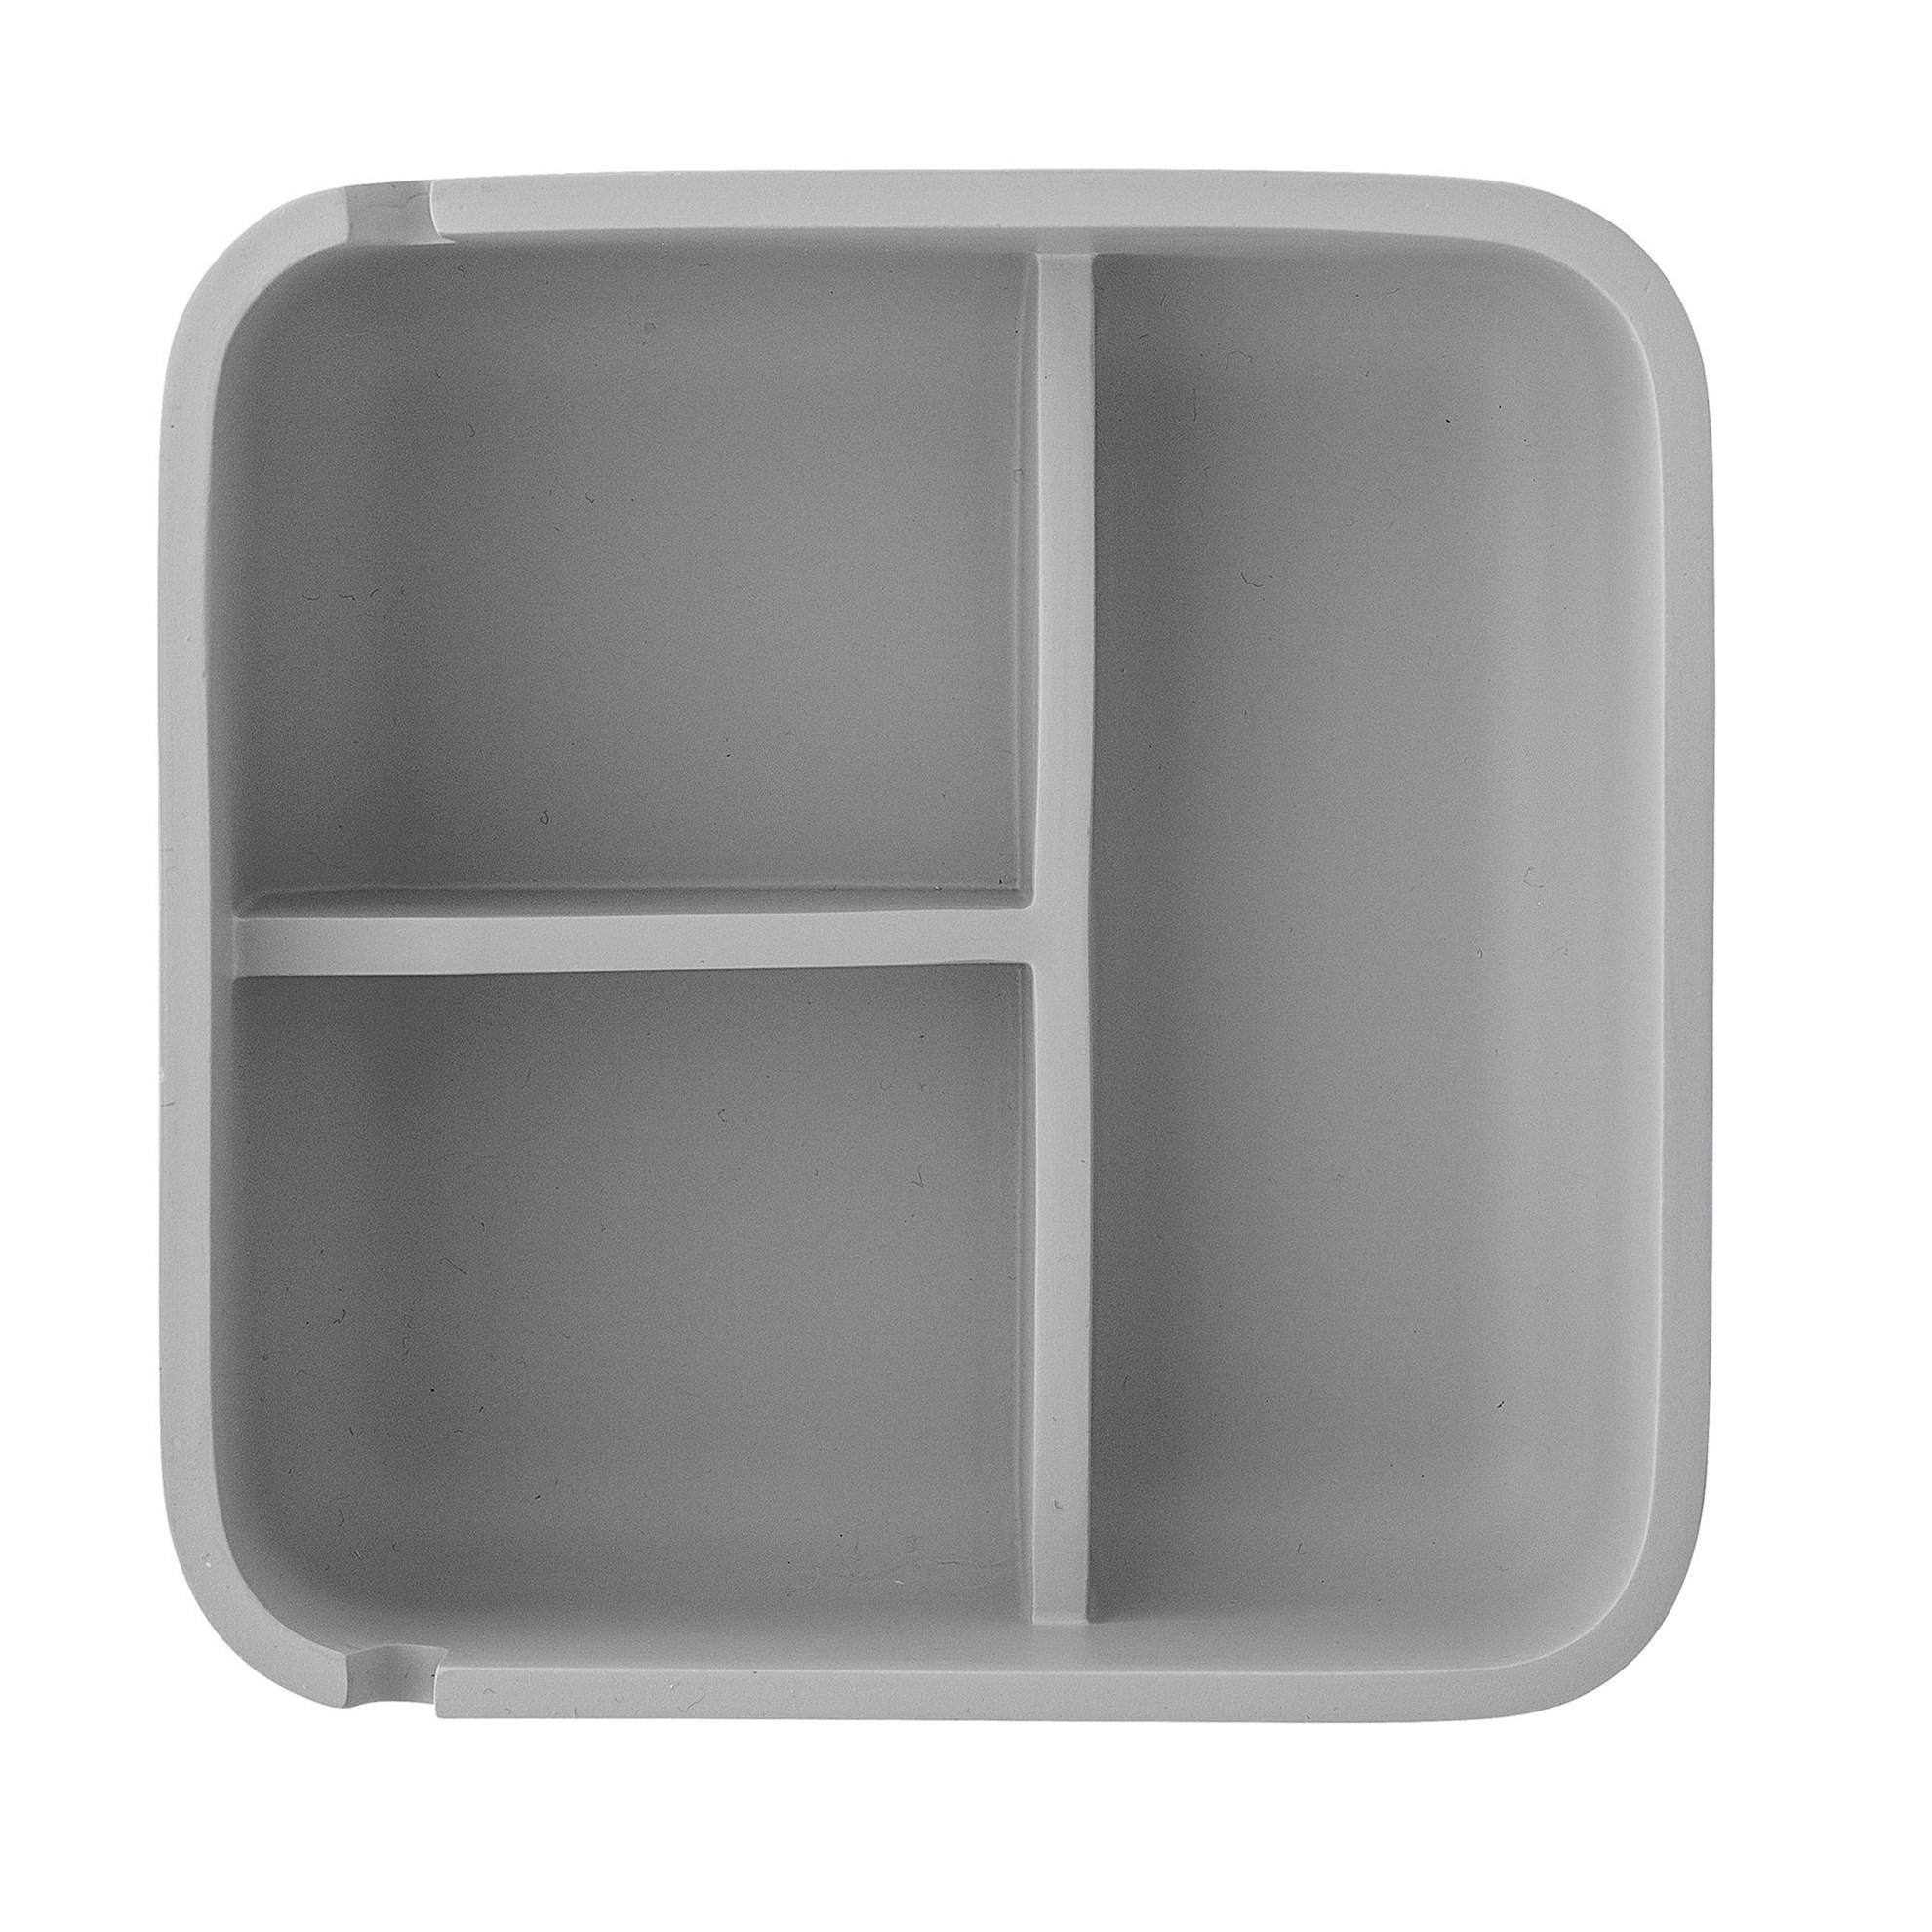 Úložný box s víčkem a zrcátkem_1